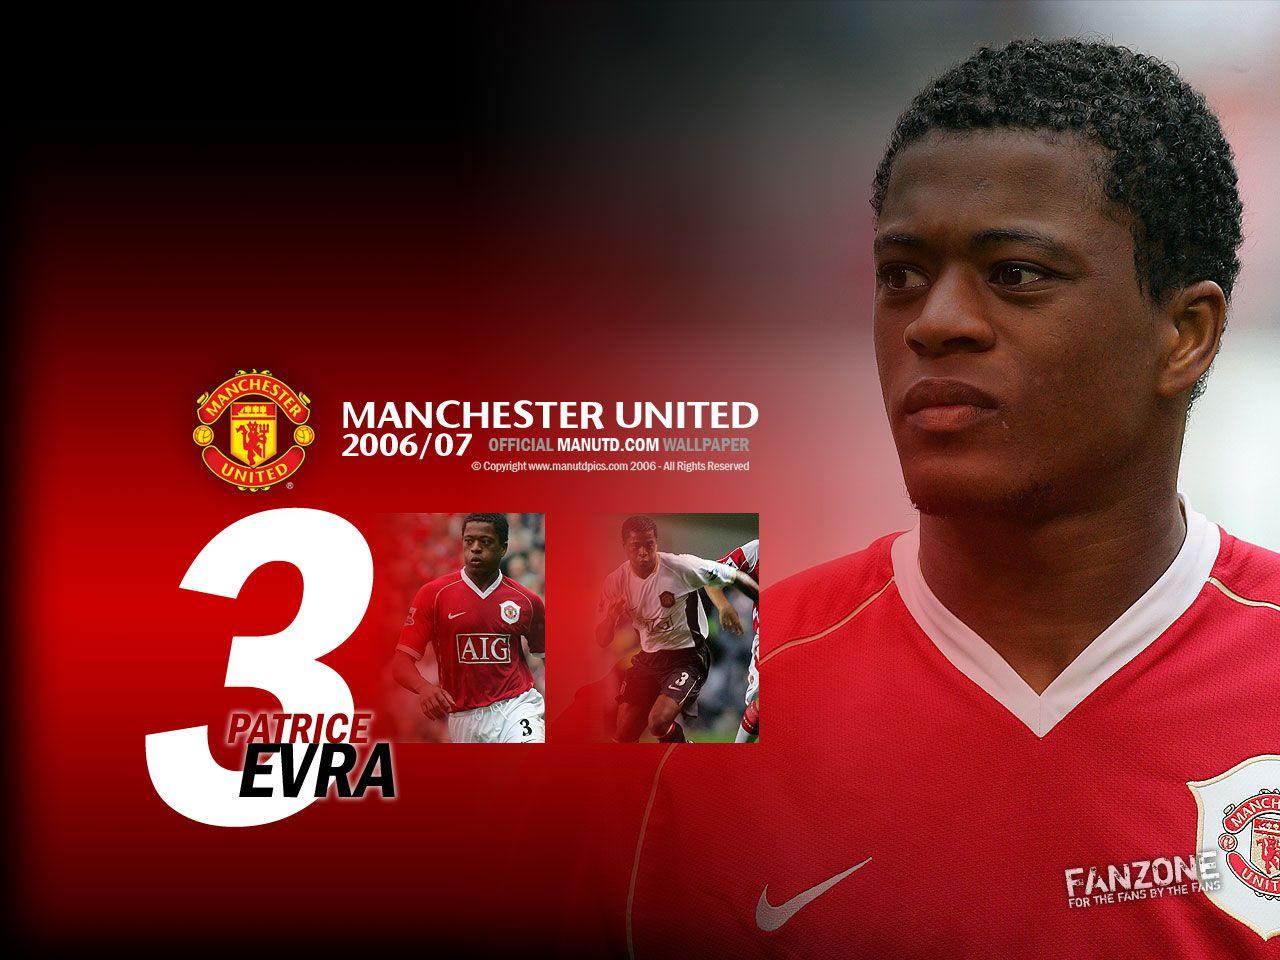 Patrice Evra football star